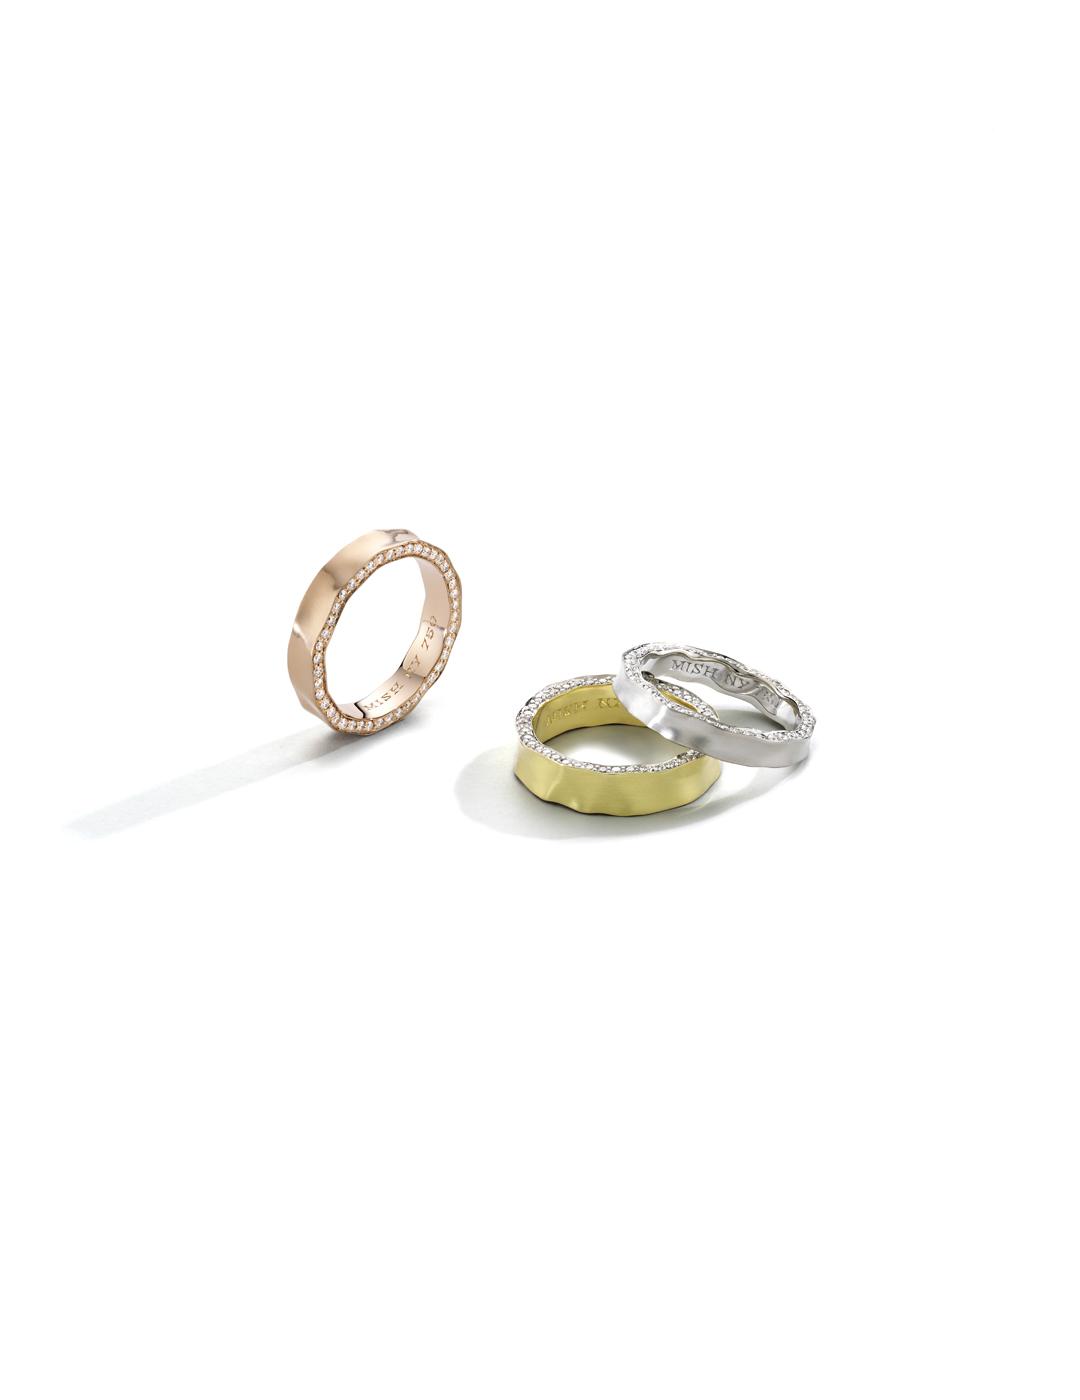 mish_products_rings_BondBow-RG-Ring-2